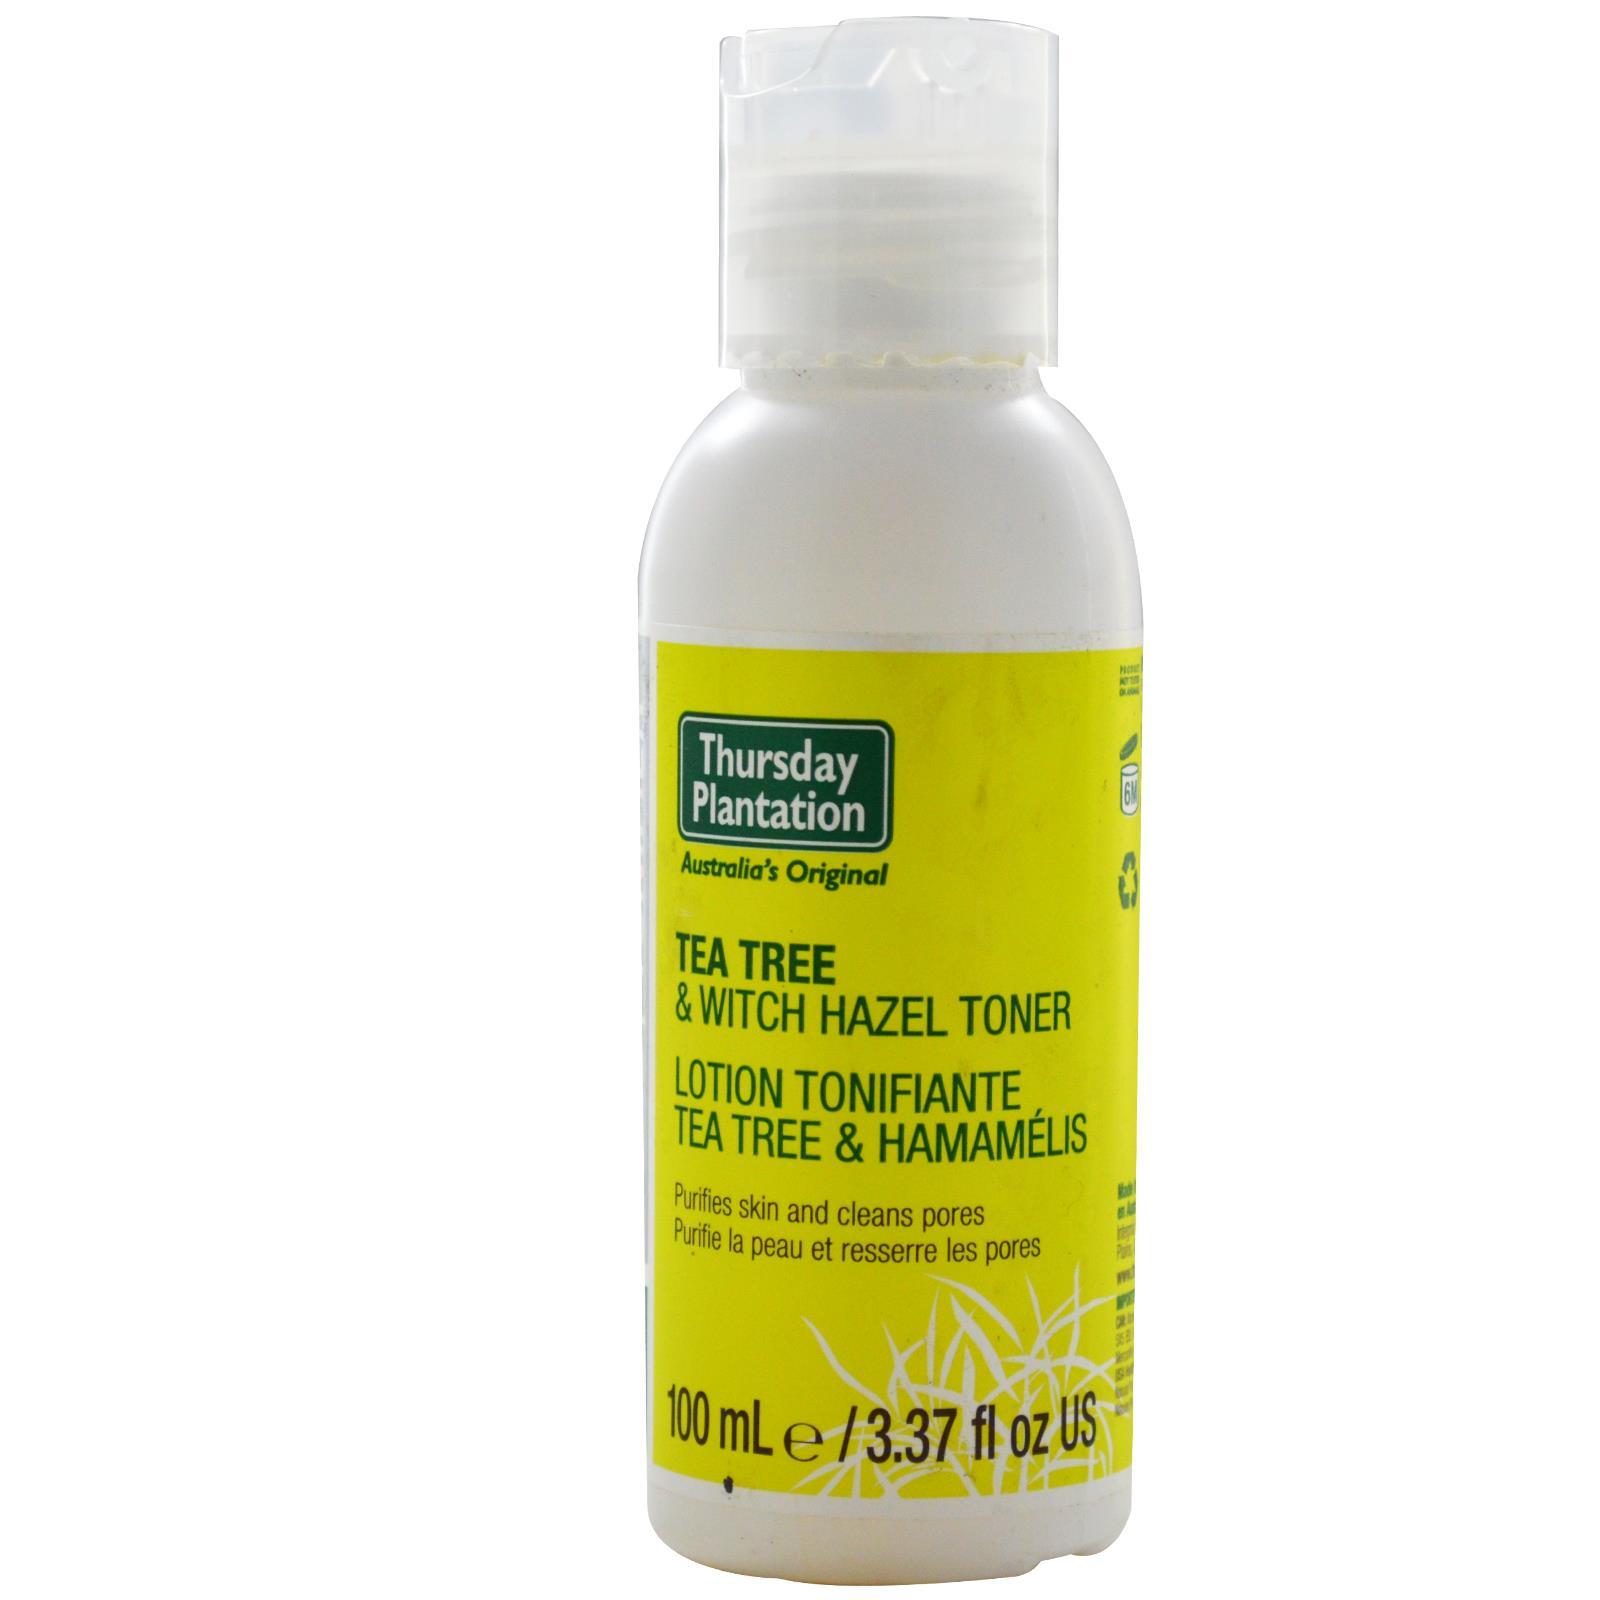 Tea Tree & Witch Hazel Toner 100ml